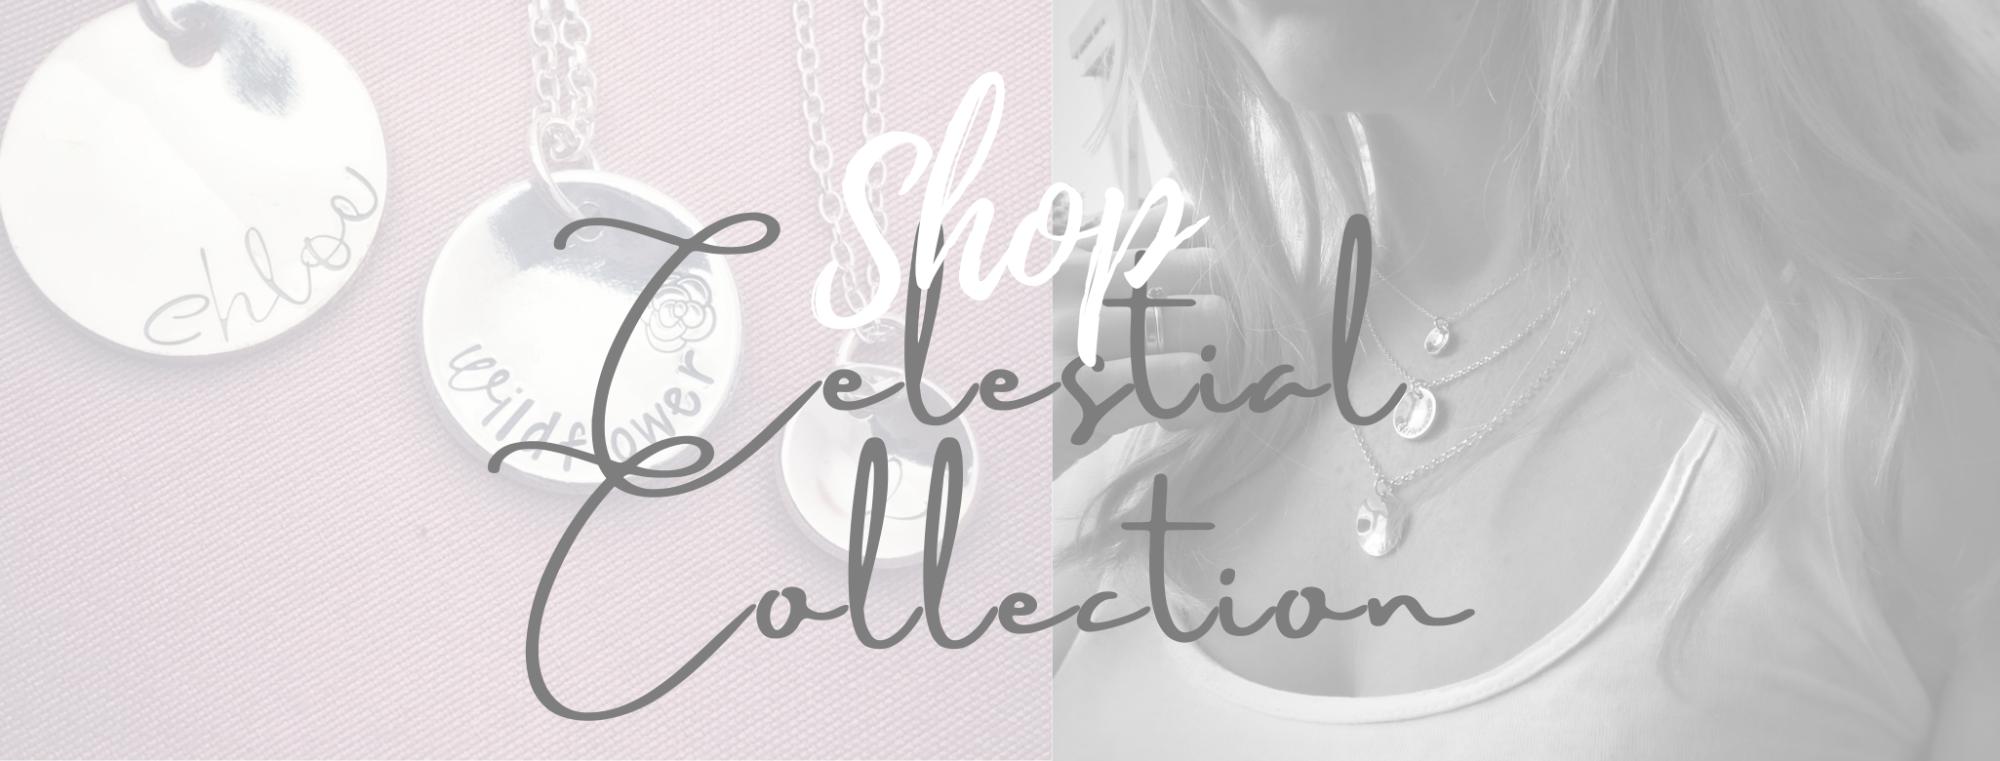 Shop Celestial Collection